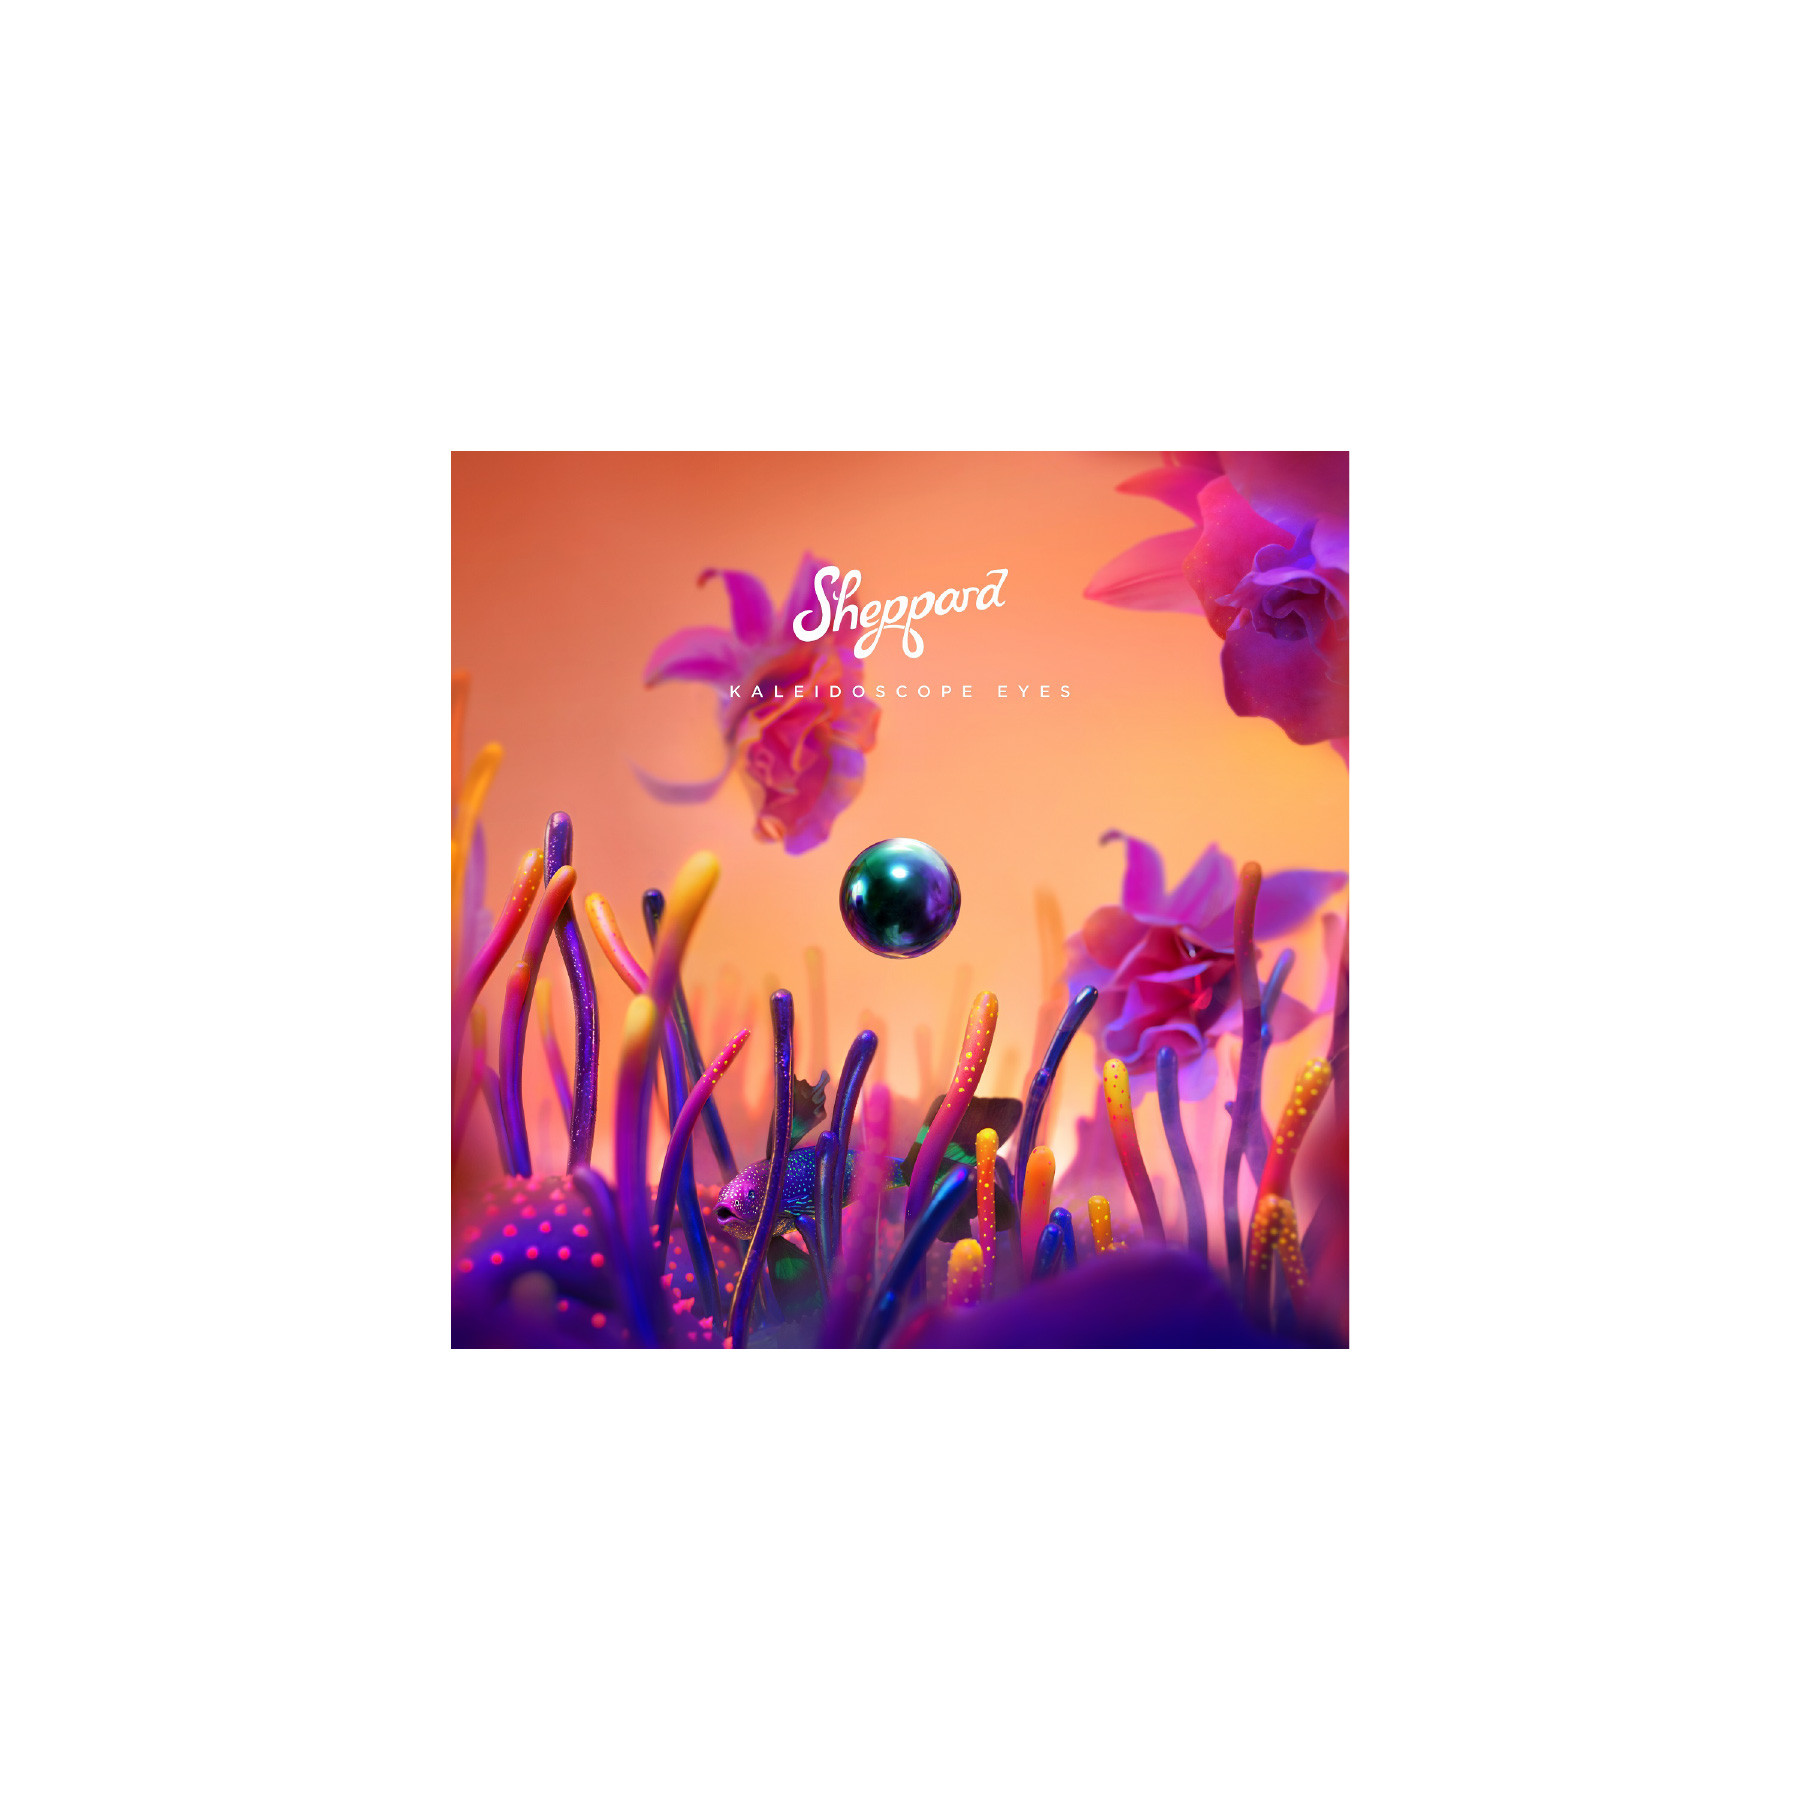 Sheppard - Kaleidoscope Eyes Digital Album